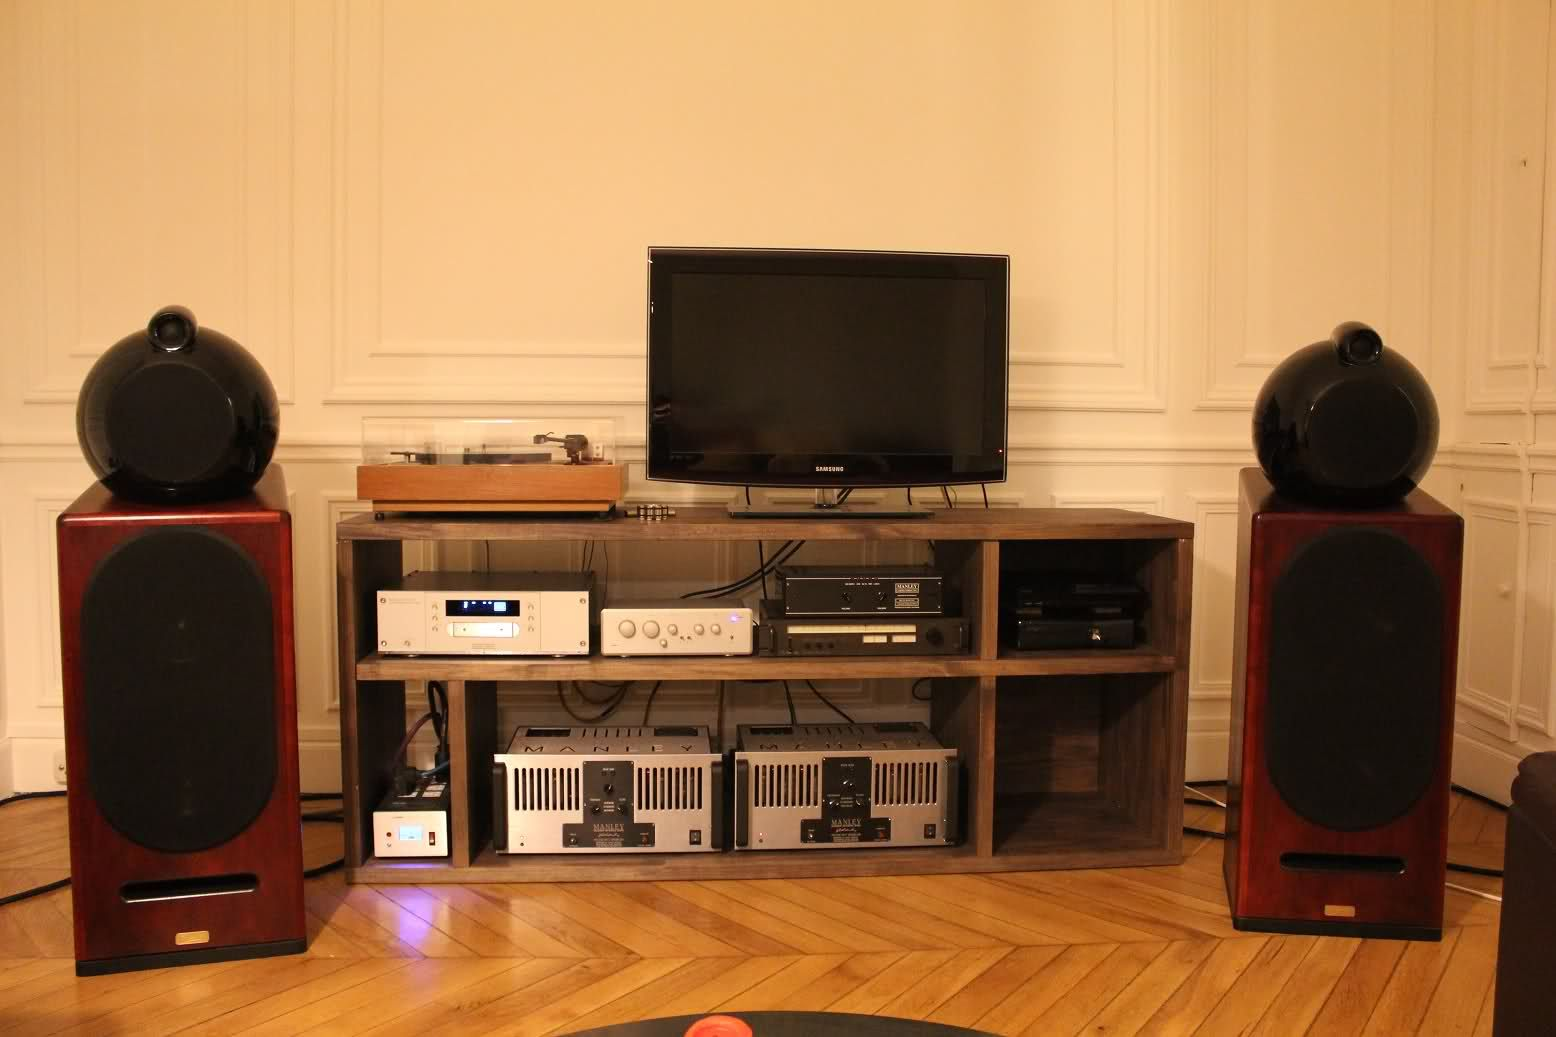 impressionnant meuble hifi bois Décoration fran§aise